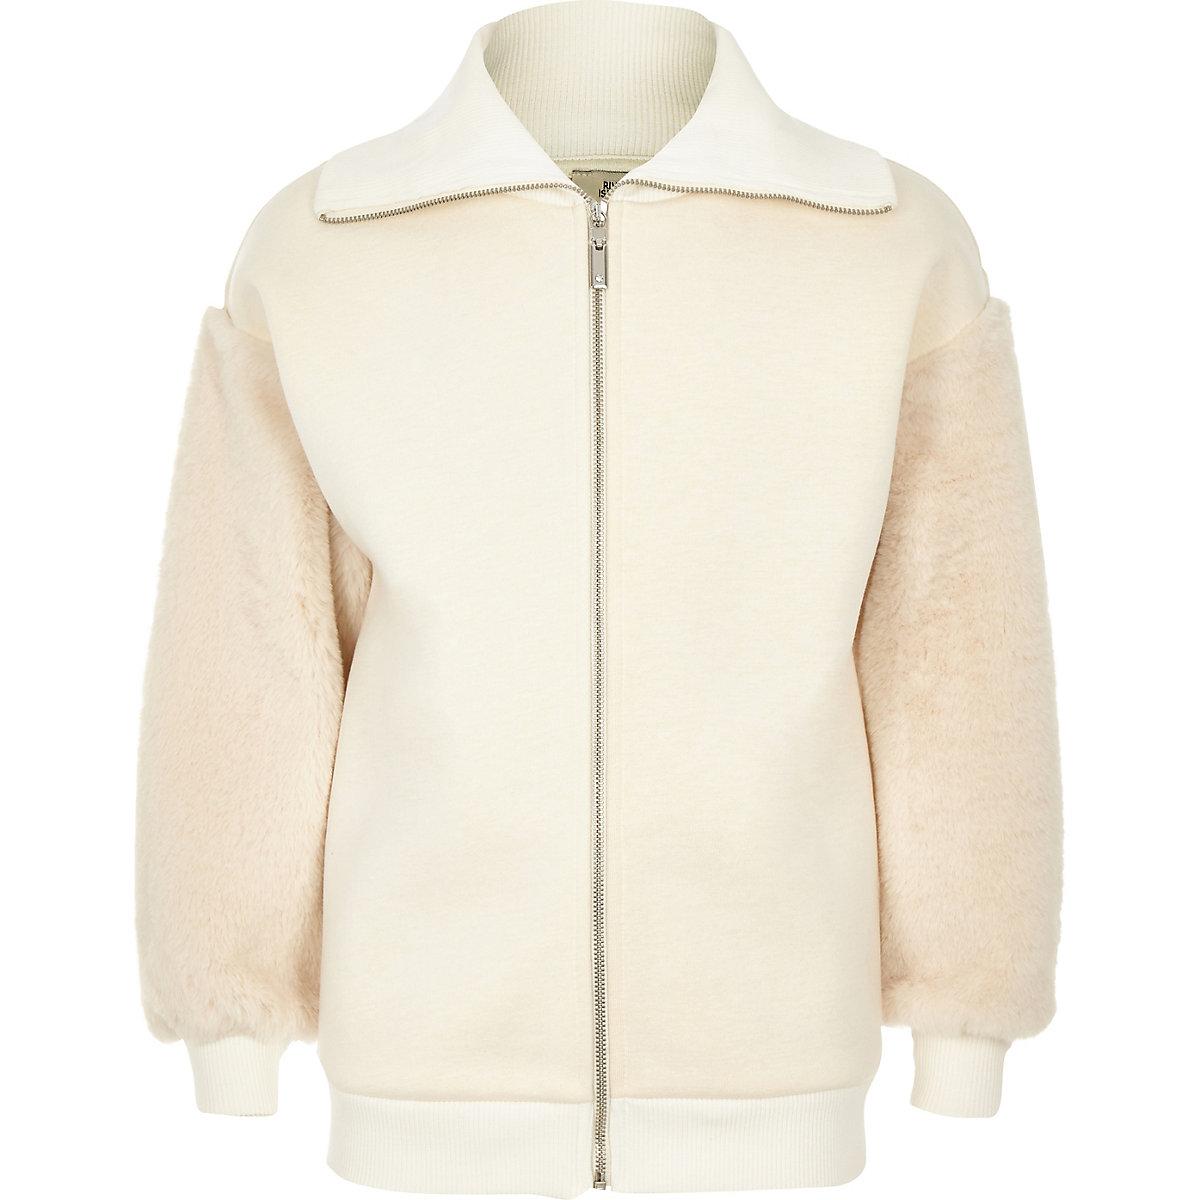 Girls cream faux fur trim zip-up sweatshirt